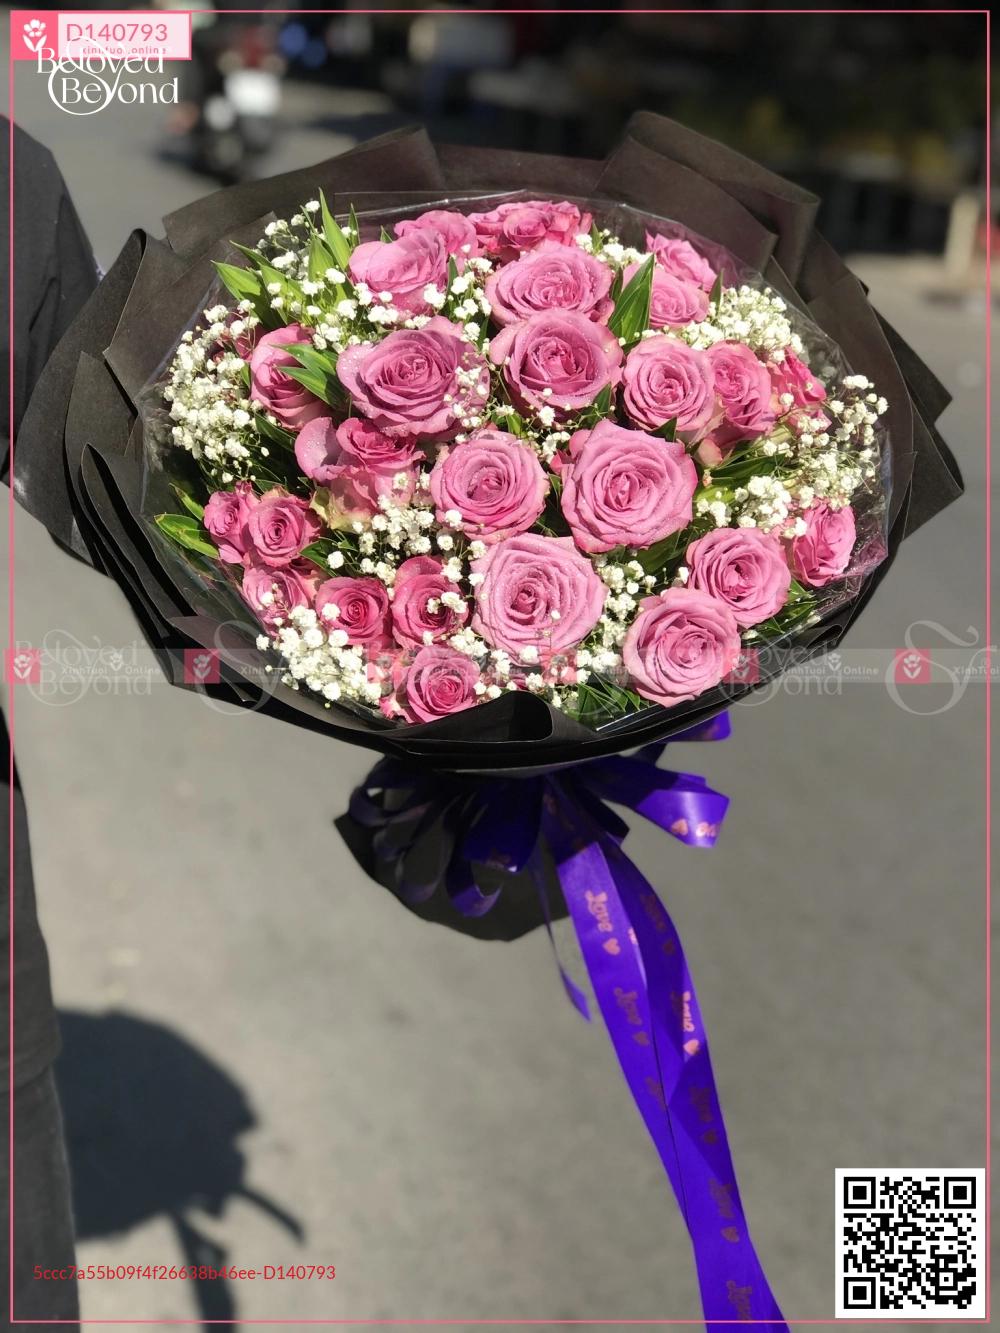 Đông sang - D140793 - xinhtuoi.online